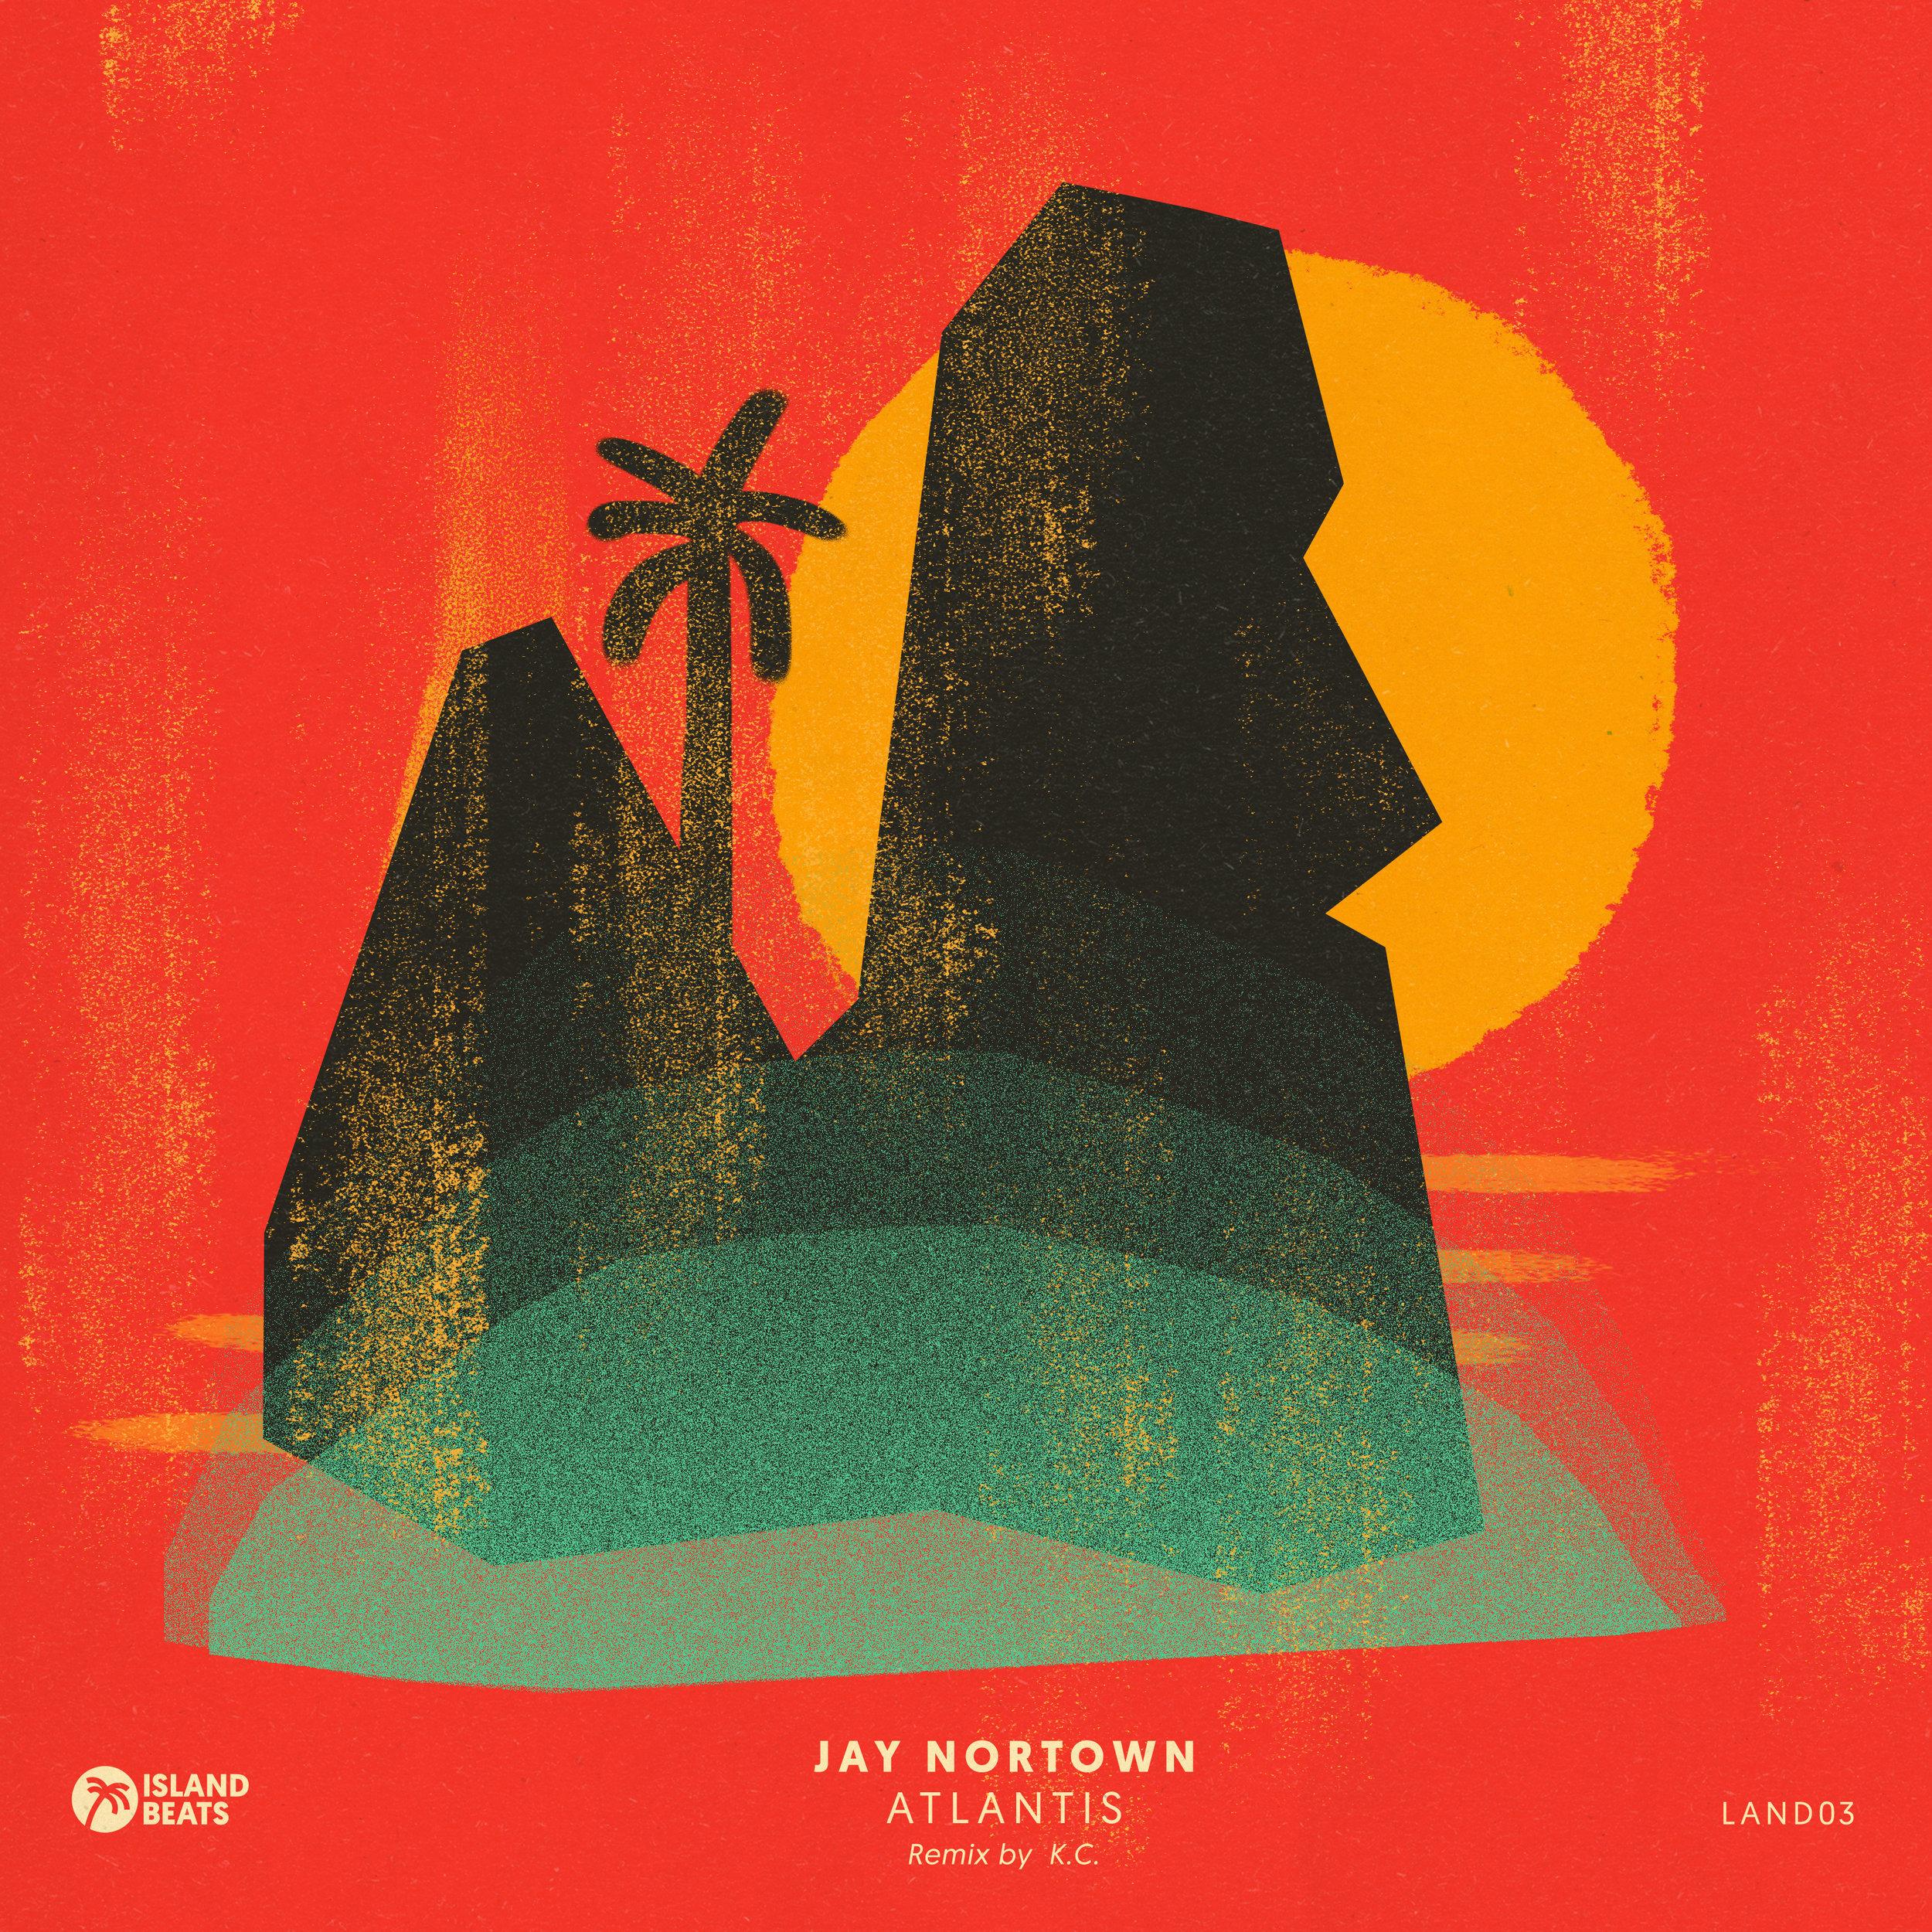 Jay Nortown - Atlantis